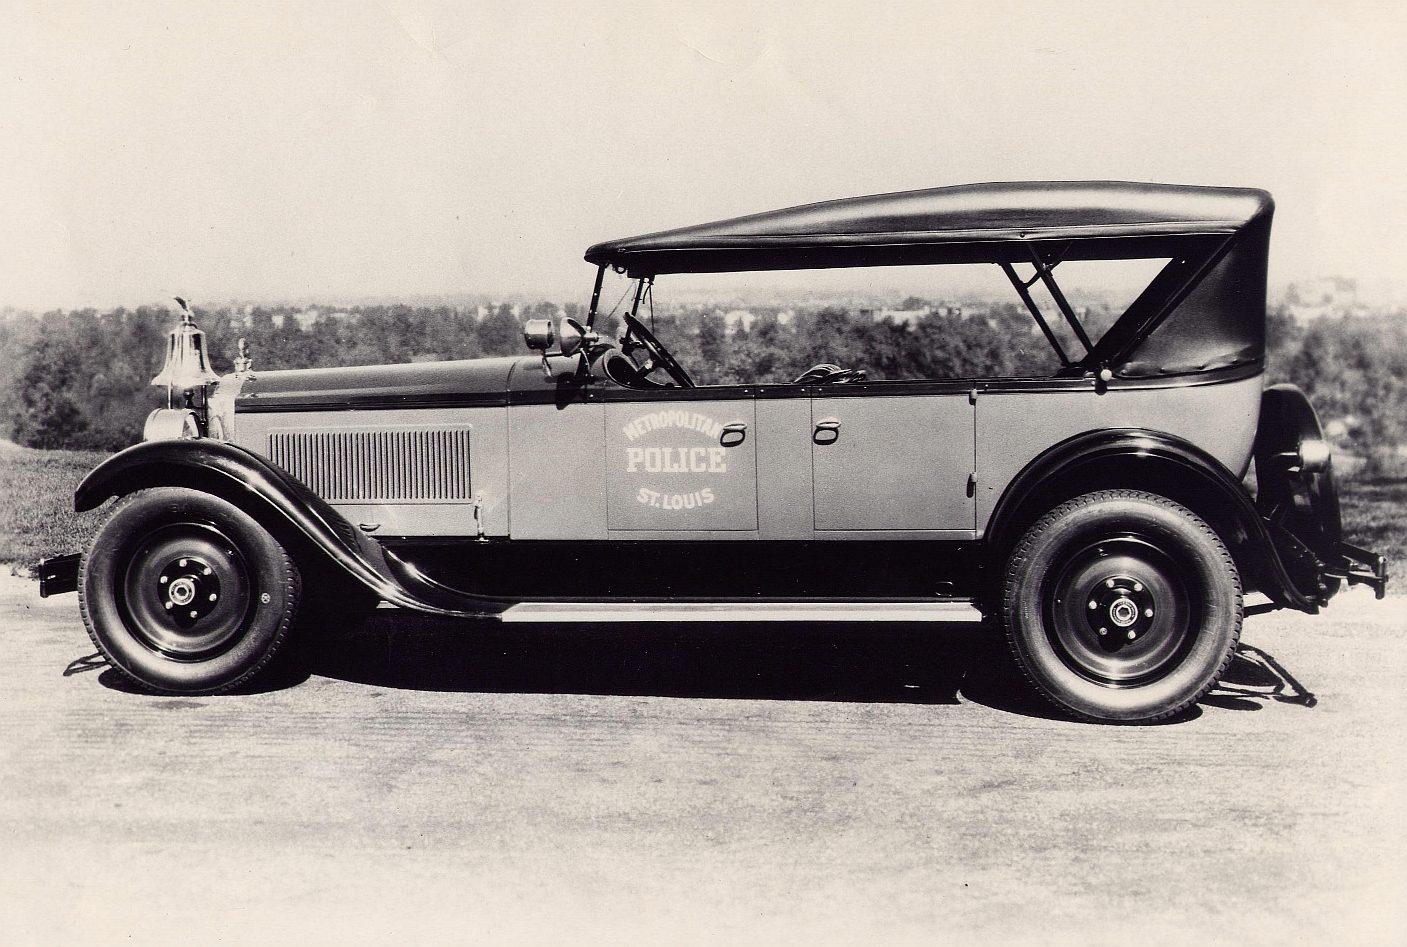 1920 Car: Lost Chapter Cruiser KFFK: 19th Annual Parent Chapter Nan